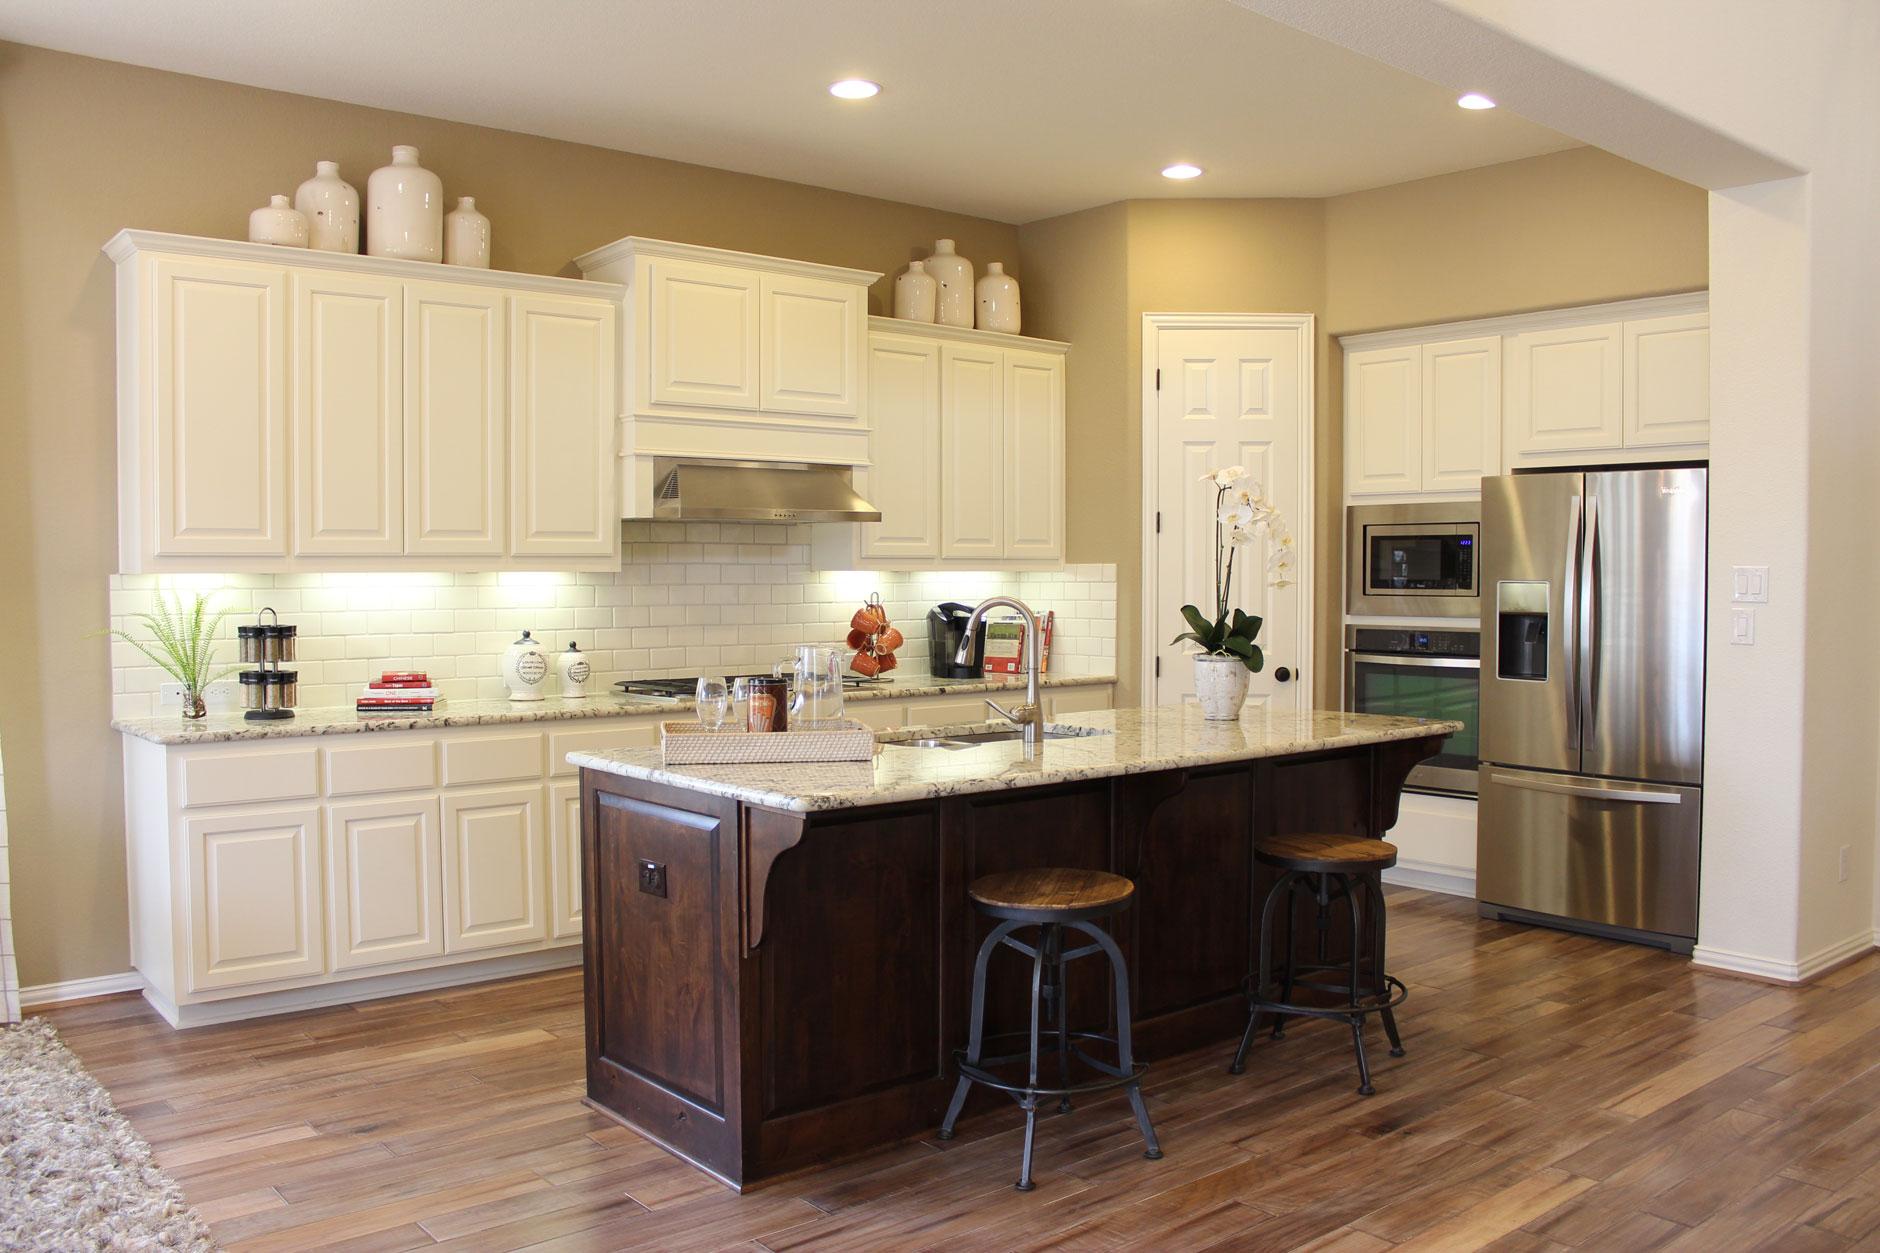 Choose flooring that complements cabinet color